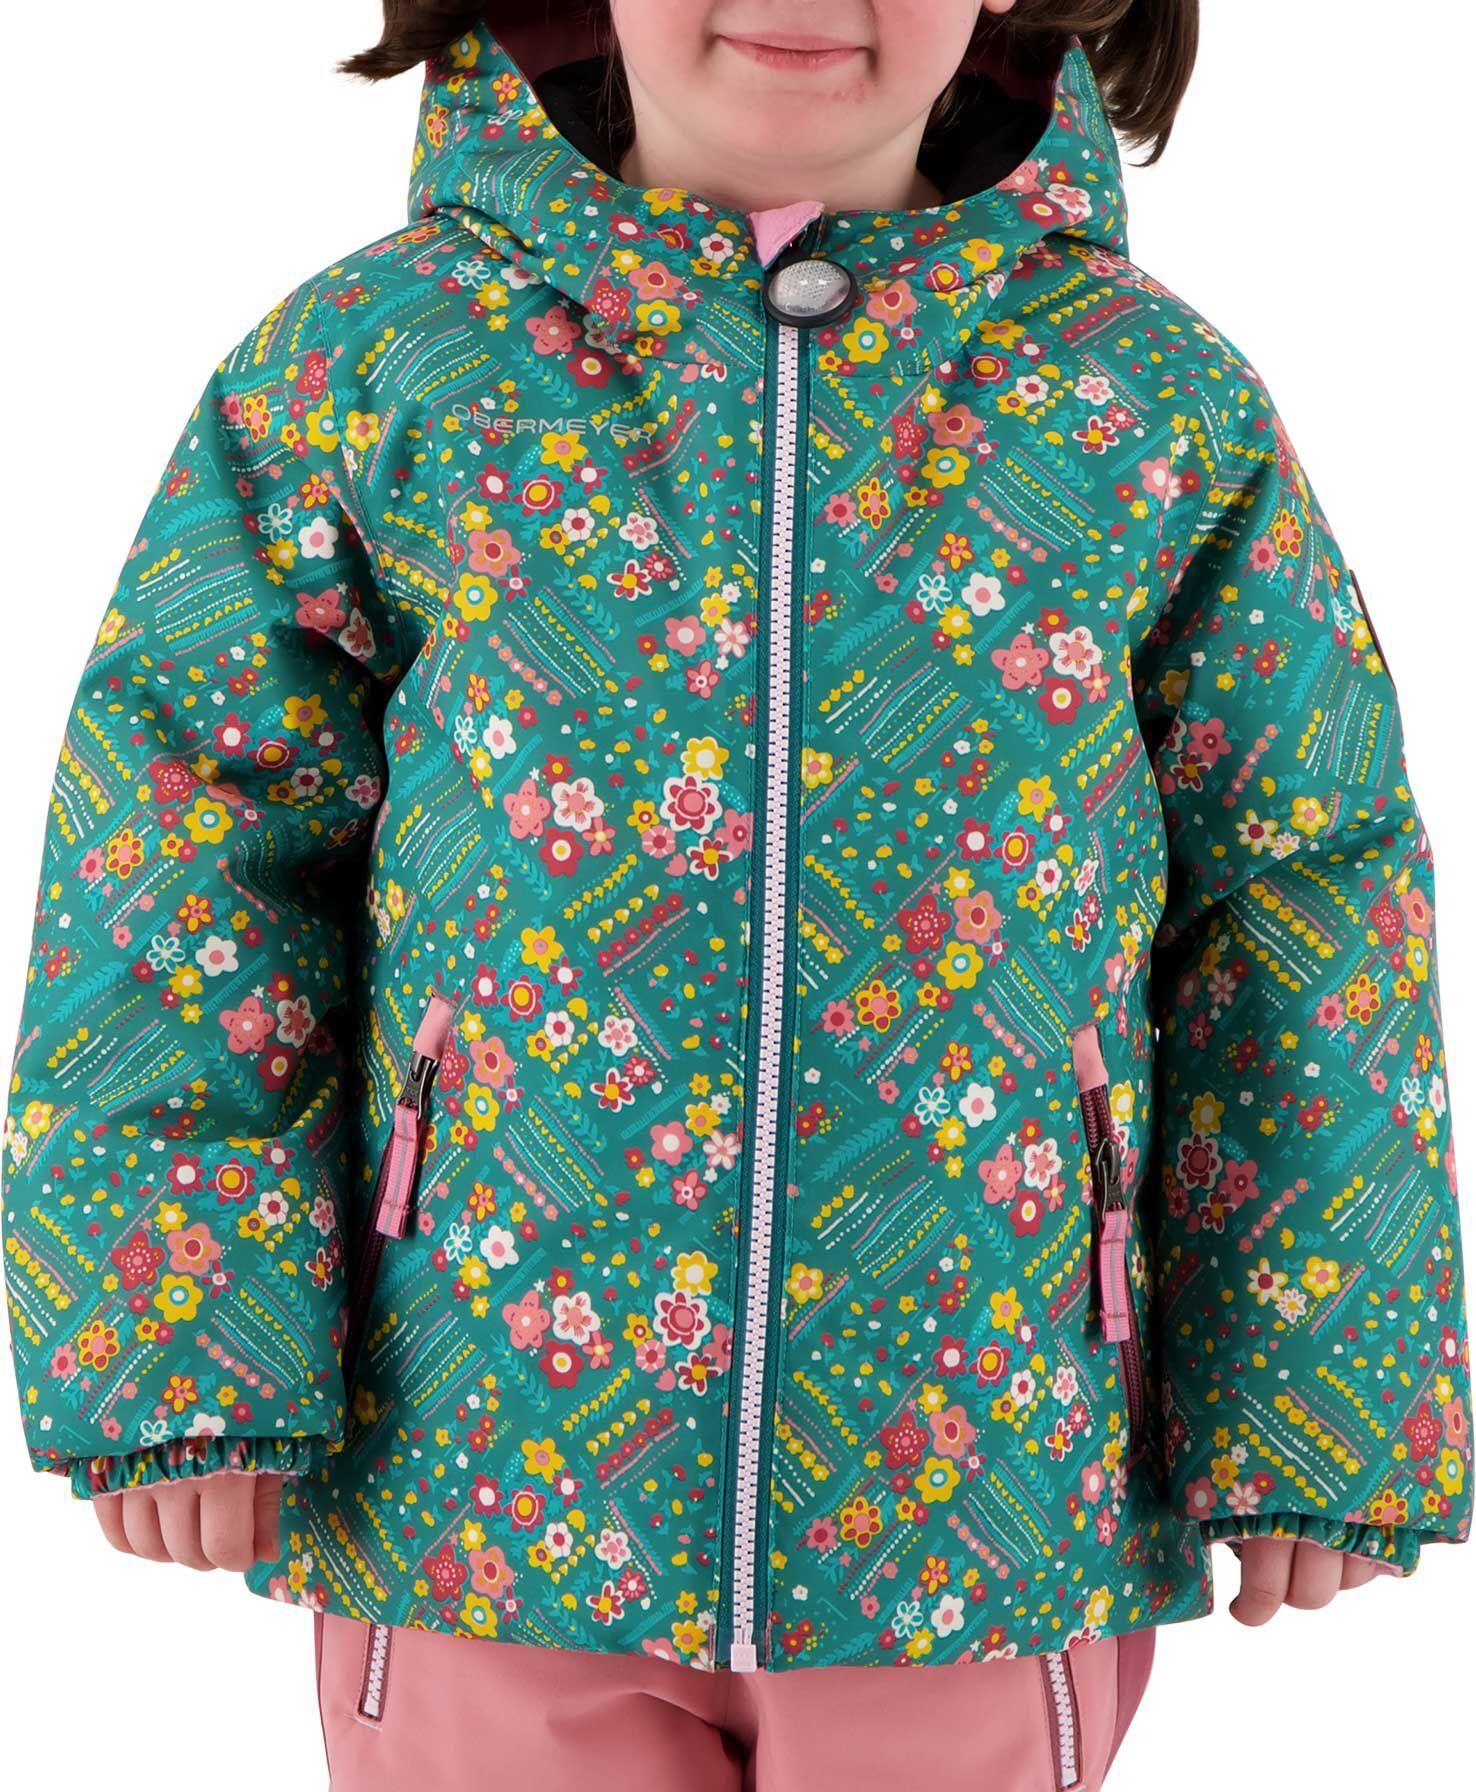 Obermeyer Youth Ash Winter Jacket, Girls', Size 4, Garden Patch